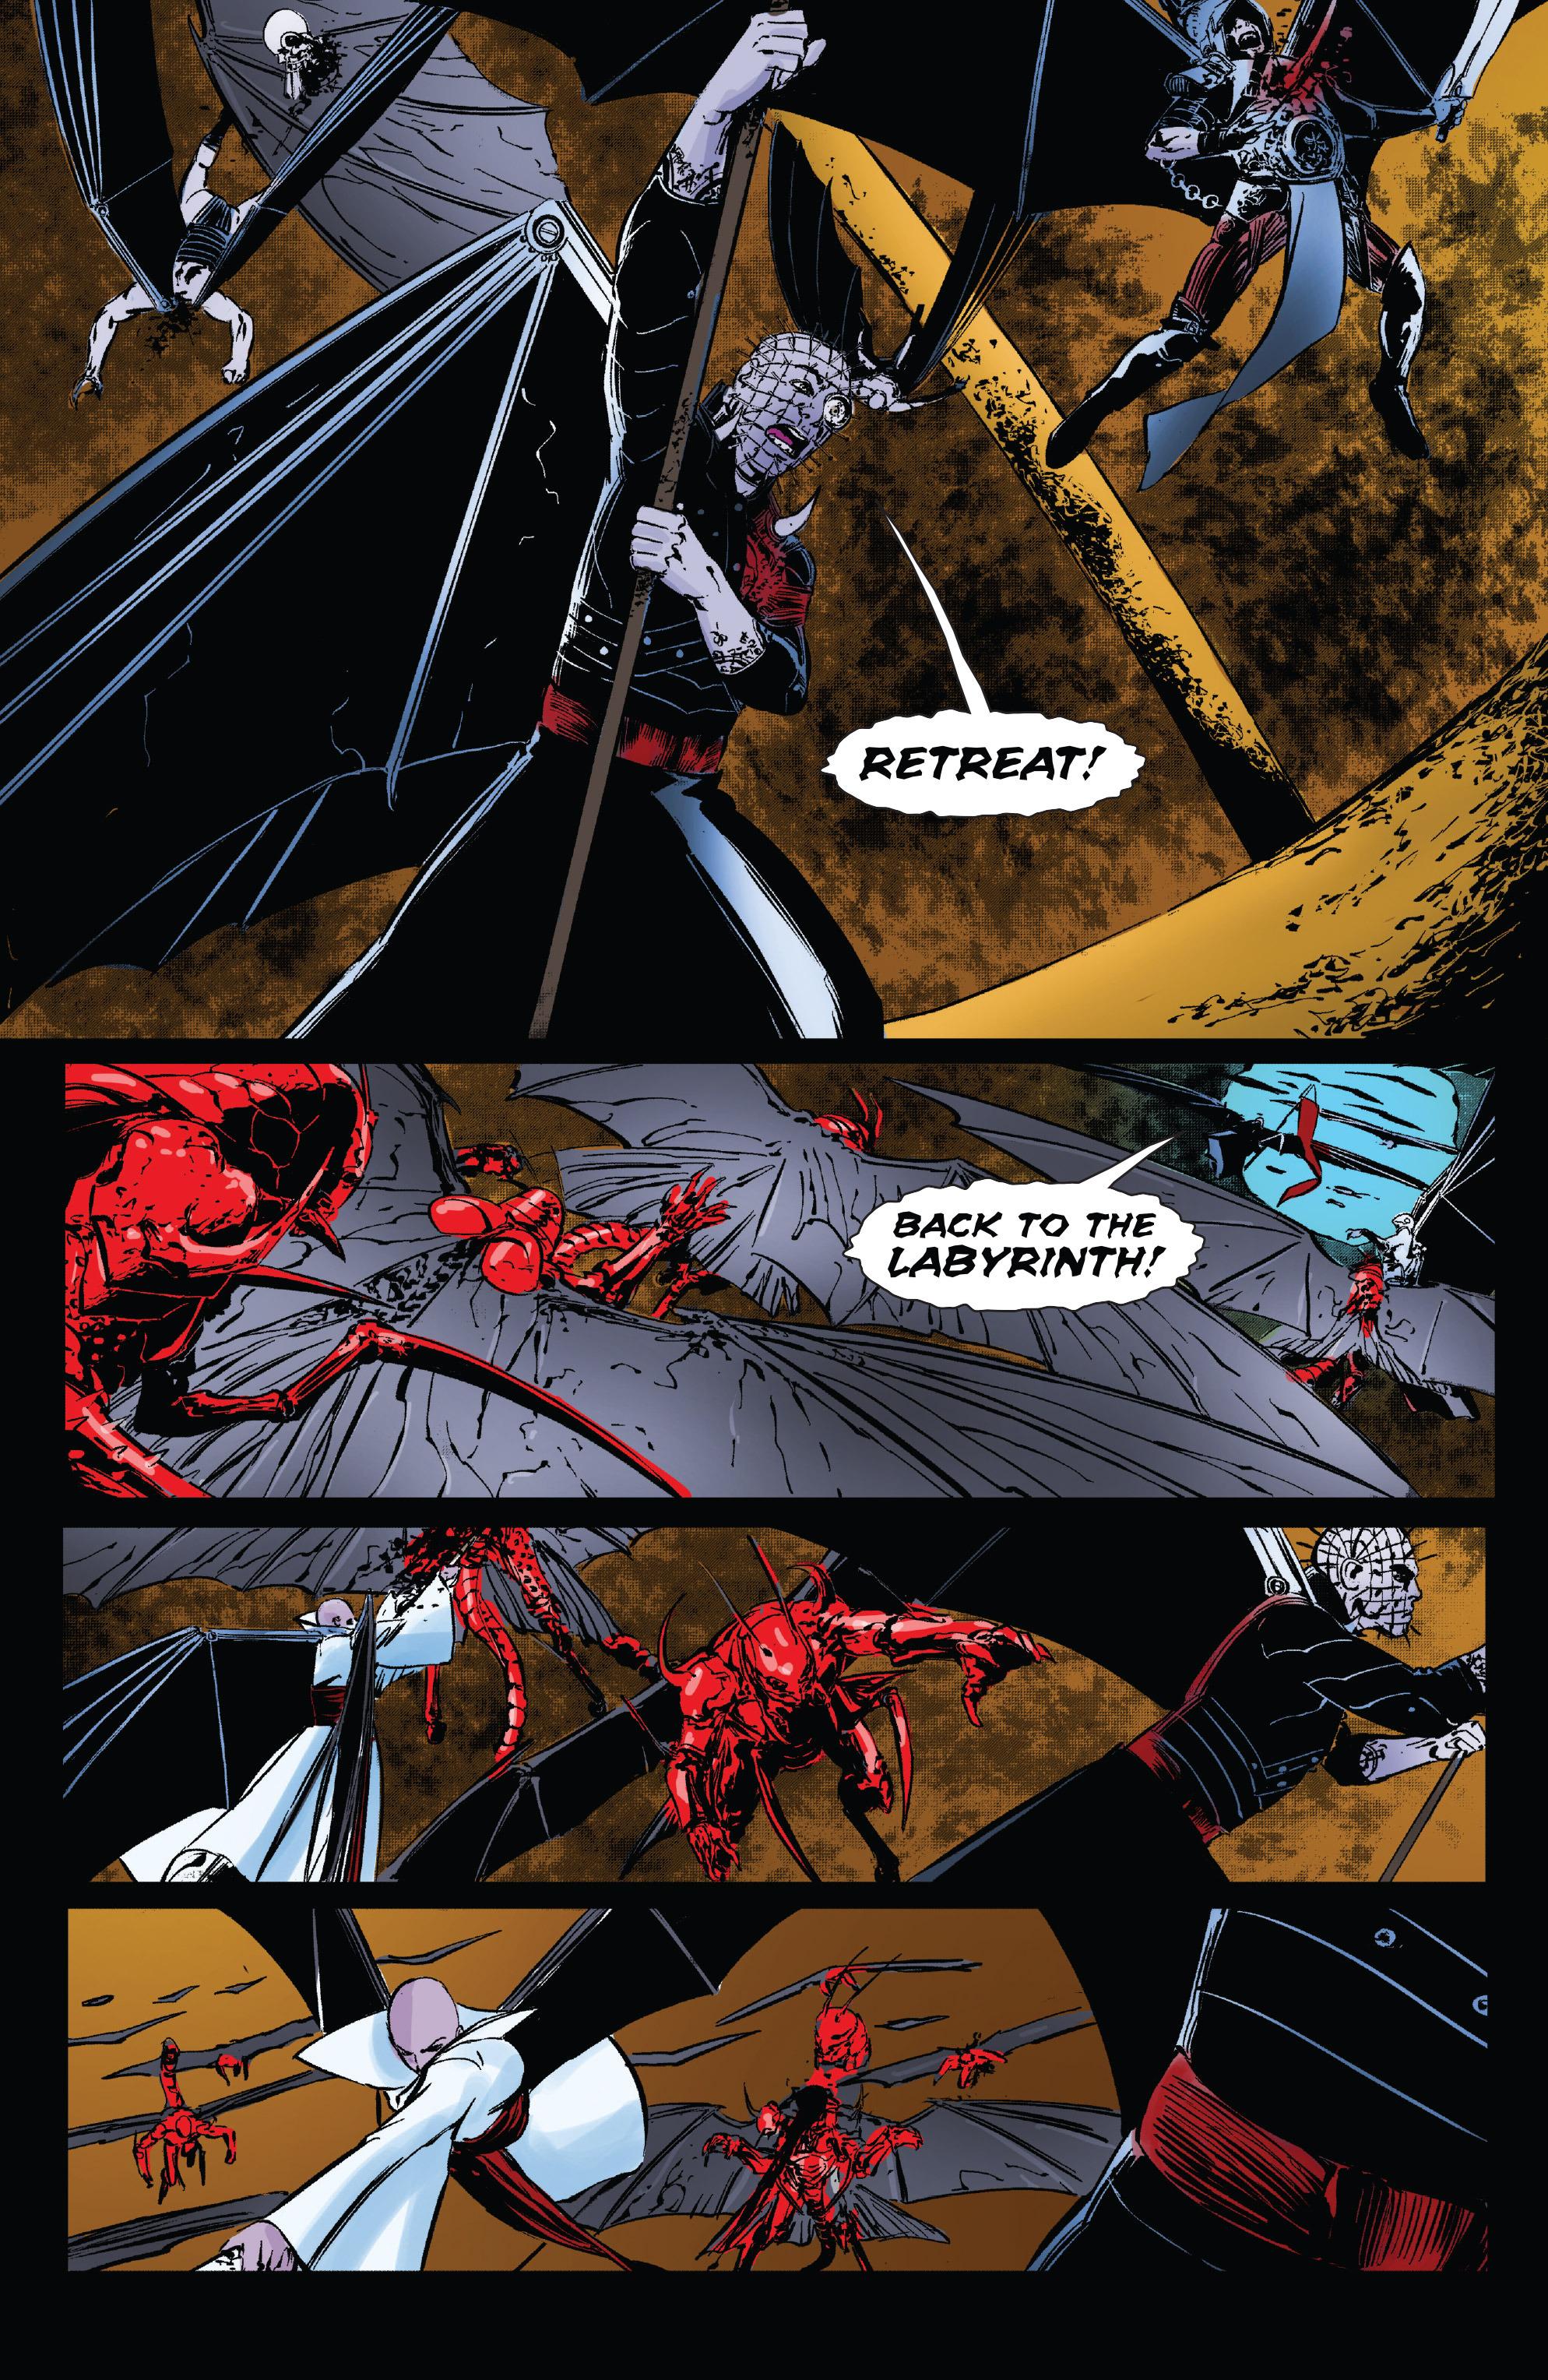 Read online Clive Barker's Hellraiser: The Dark Watch comic -  Issue # TPB 3 - 77